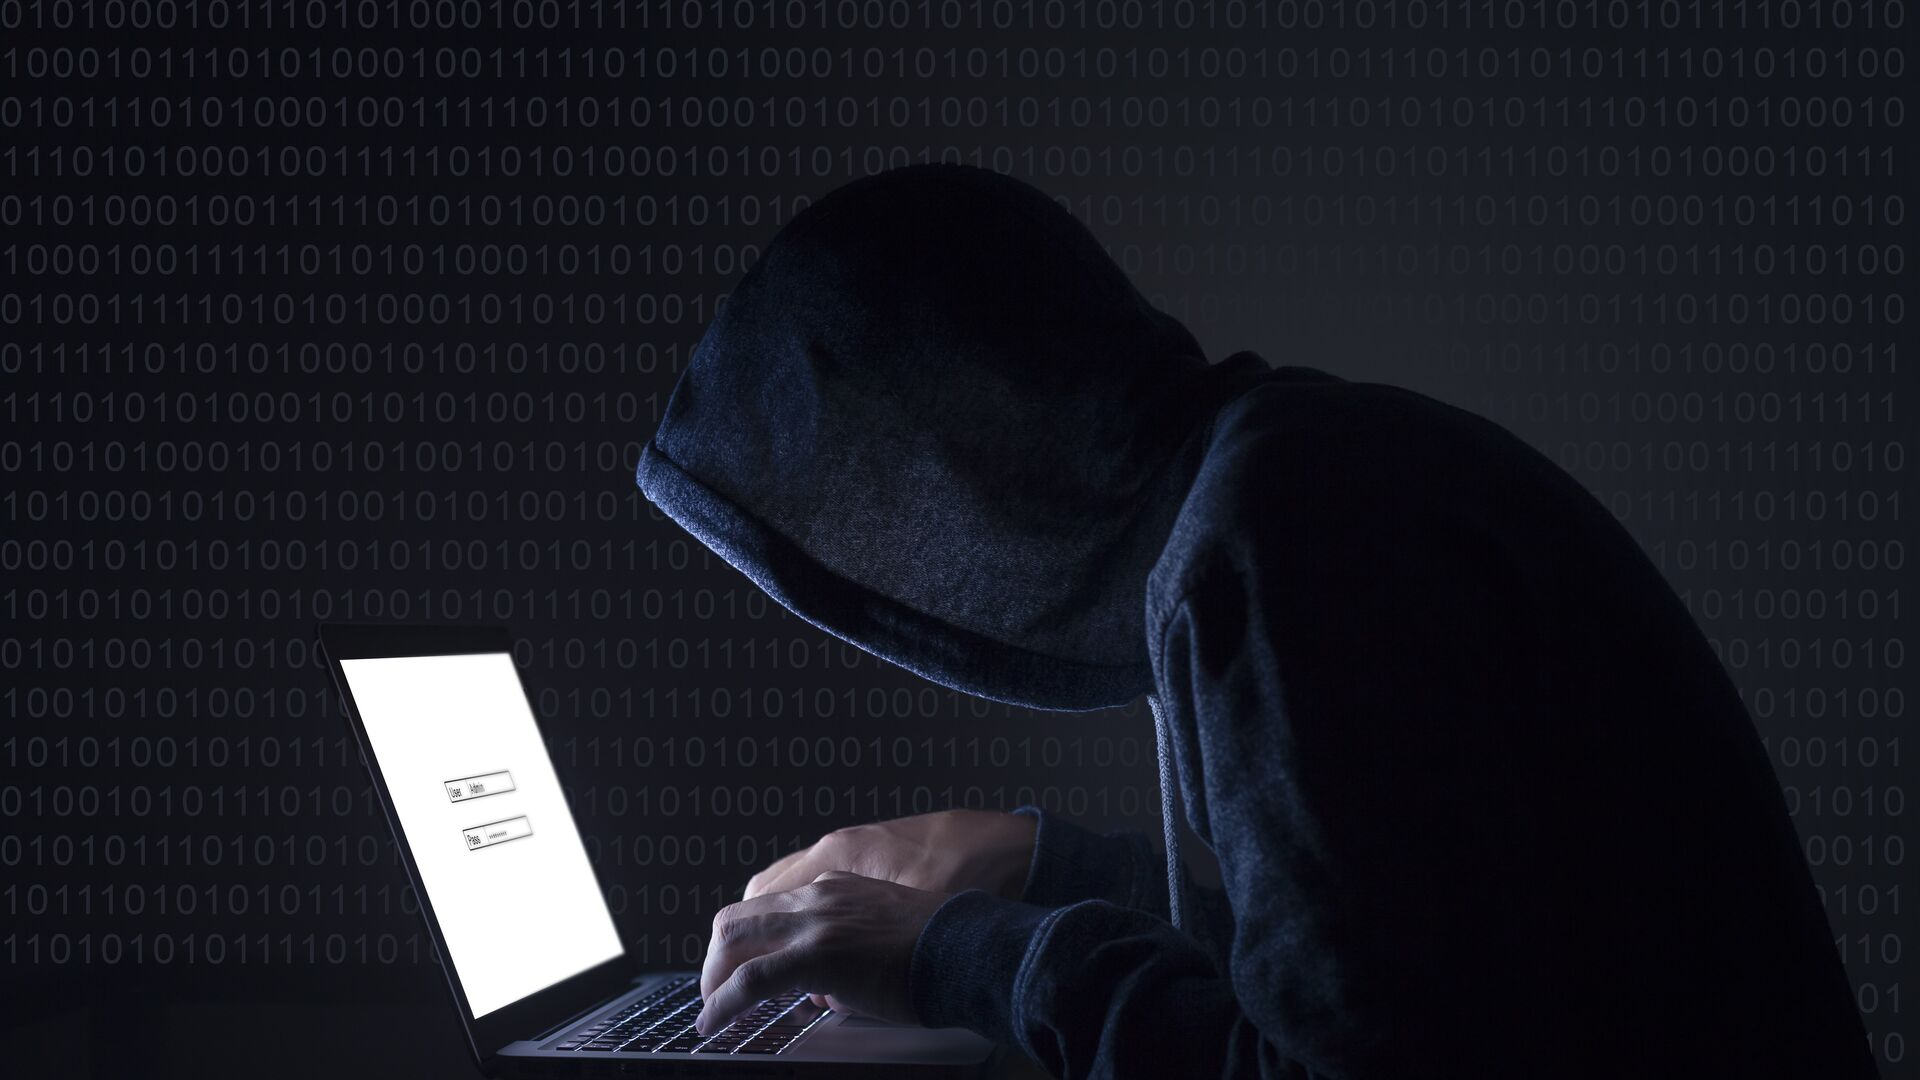 Хакер за компьютером - РИА Новости, 1920, 01.03.2021